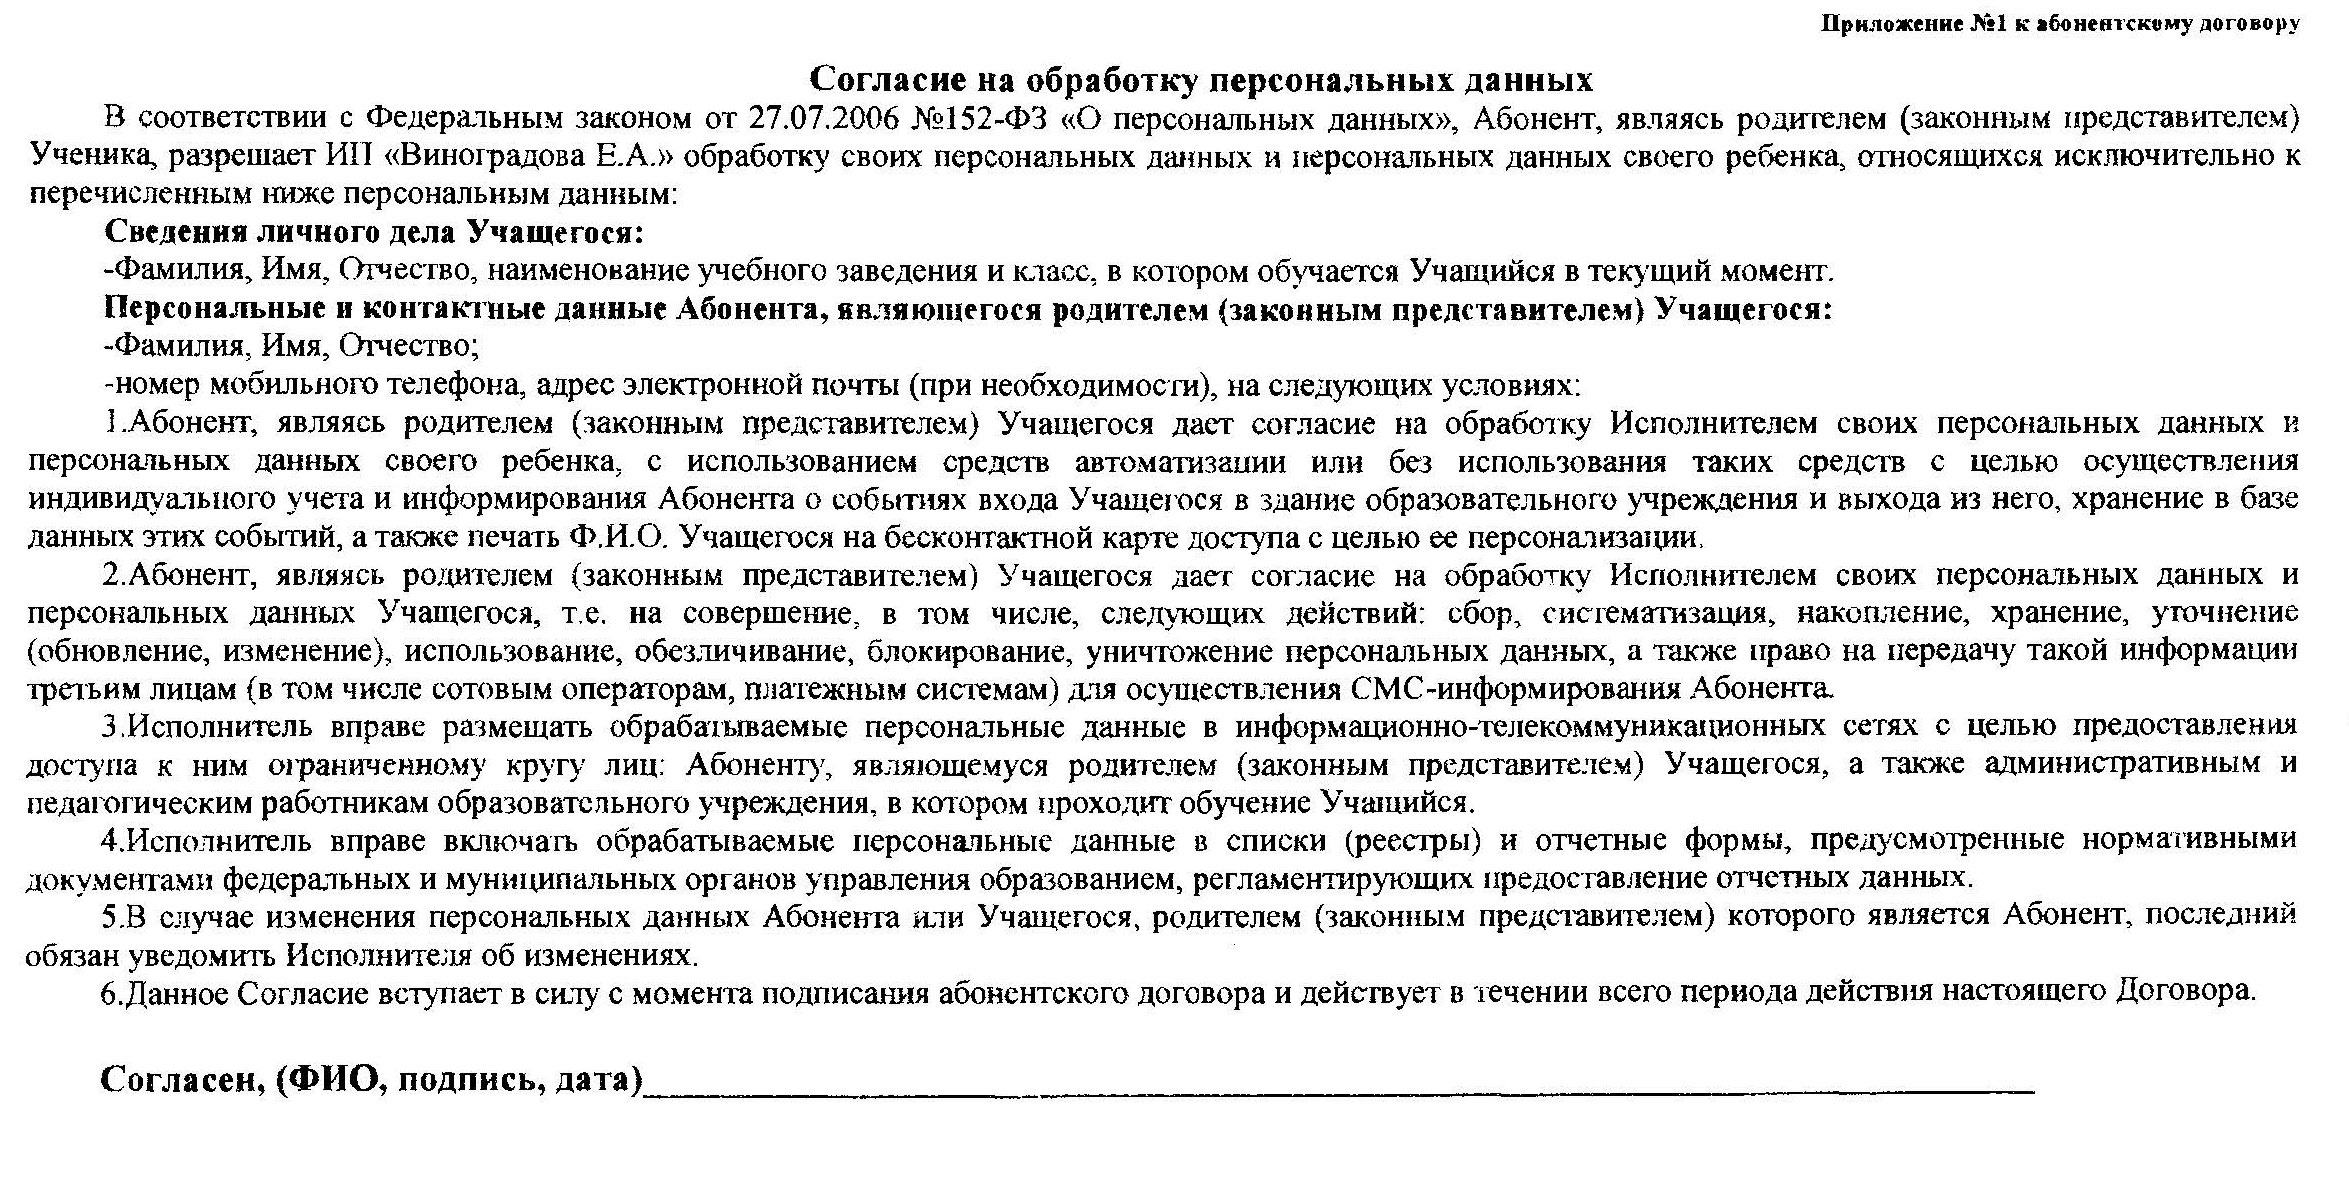 электронный журнал 513 школы москва